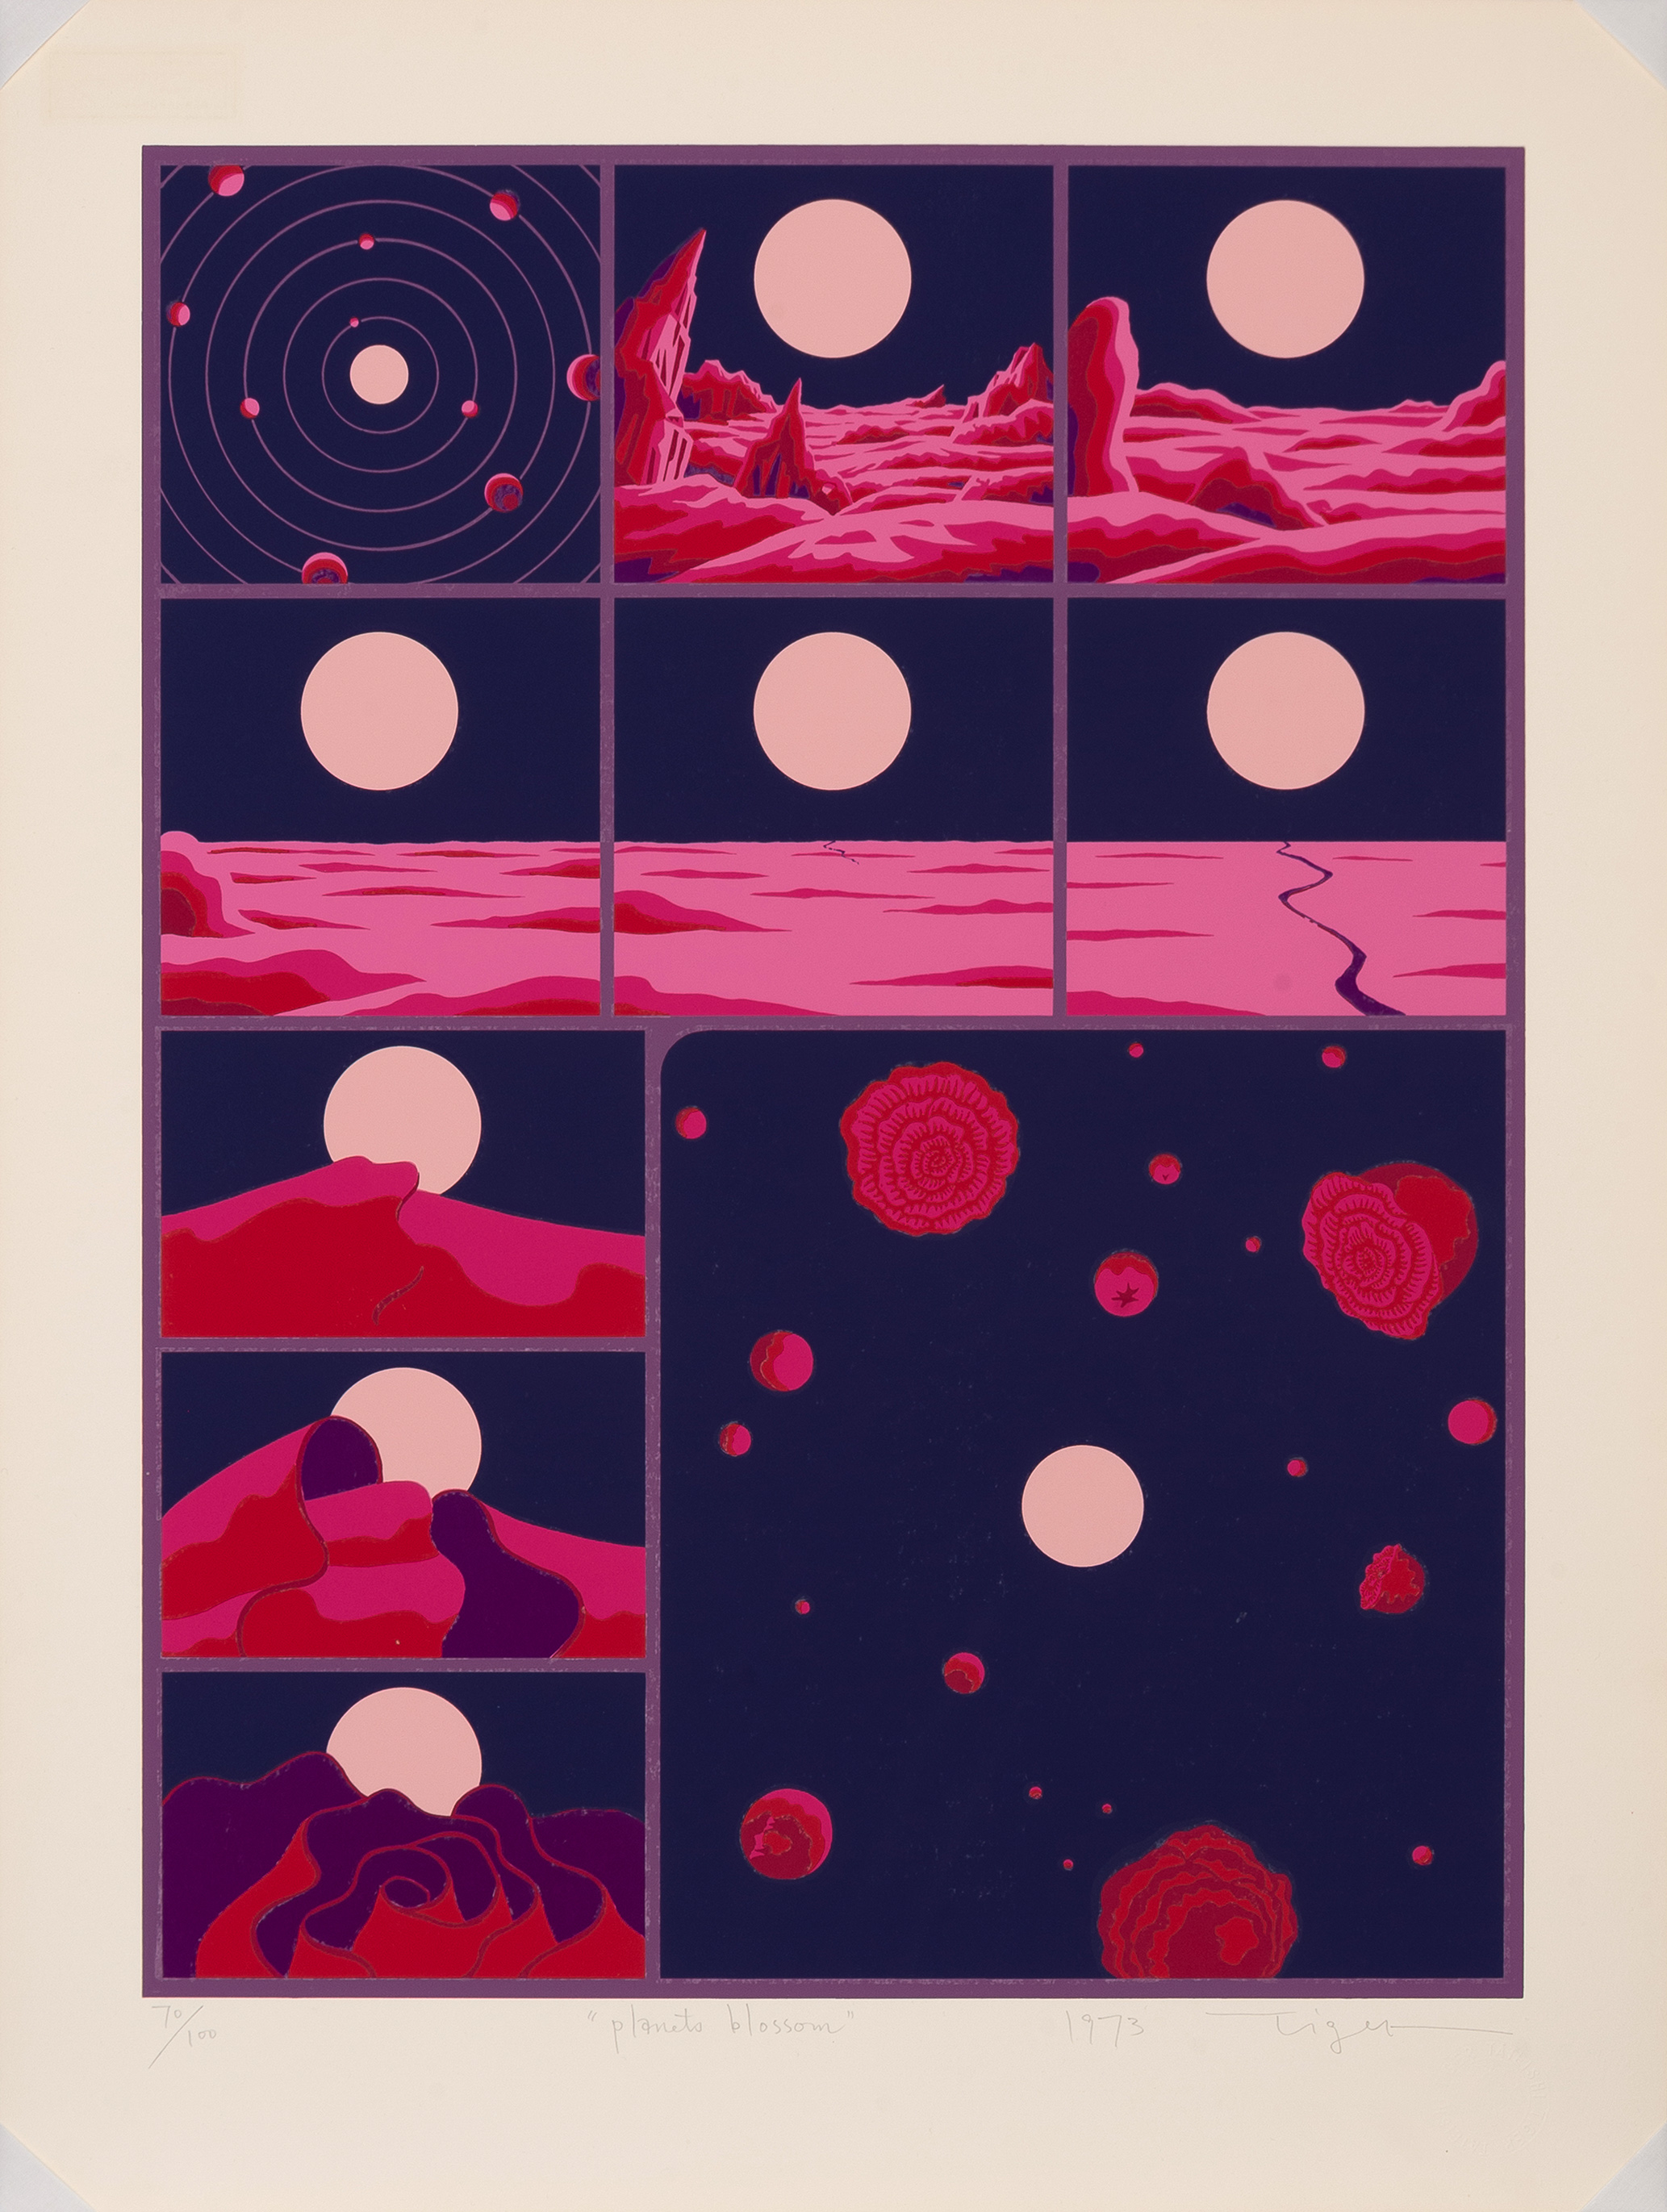 Planets Blossom, 1973